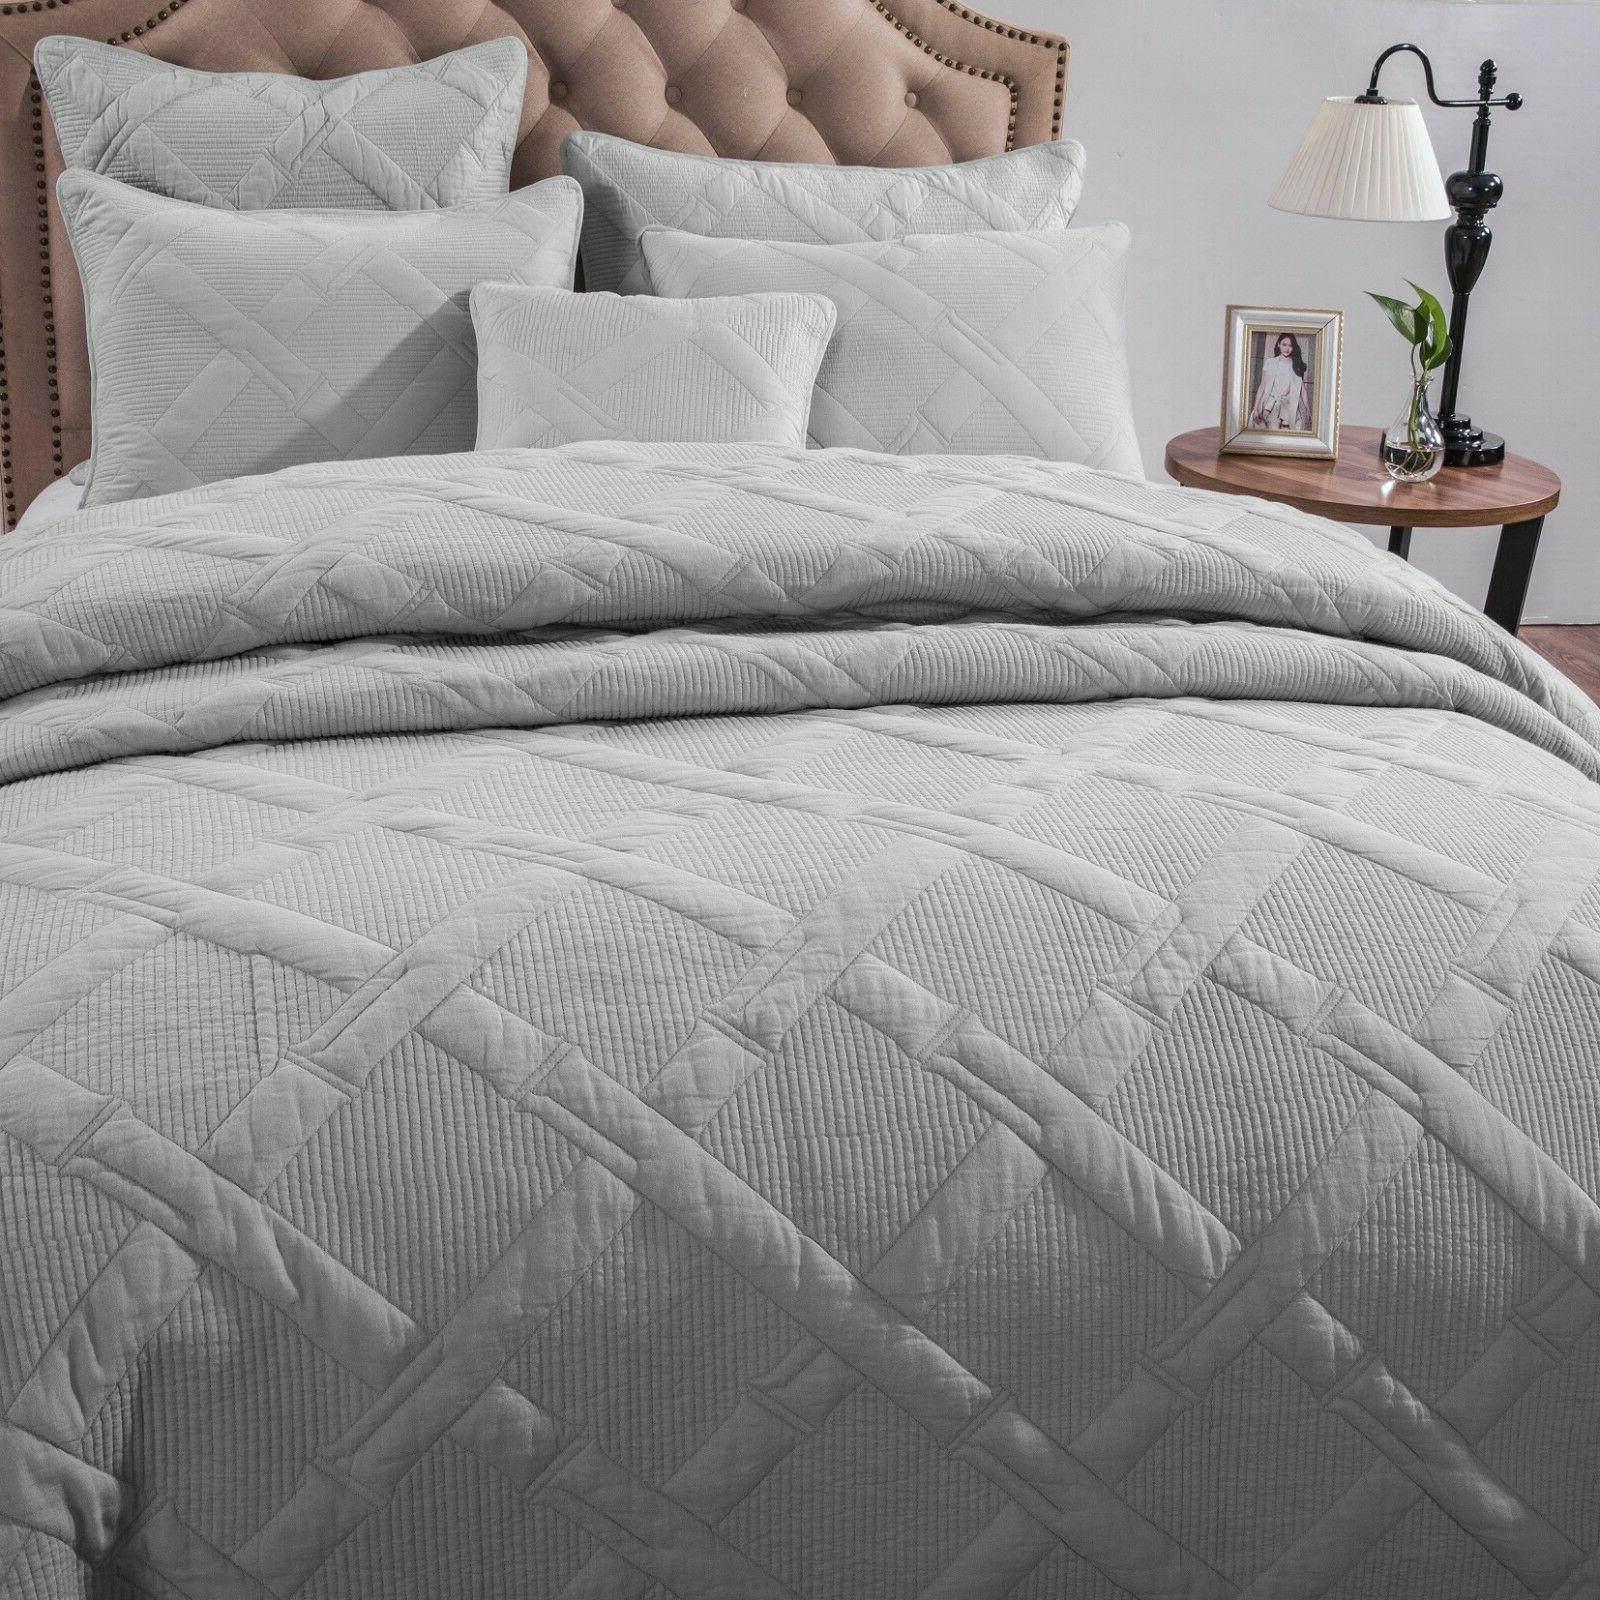 Tache Solid Silver Lightweight Quilt Coverlet Set